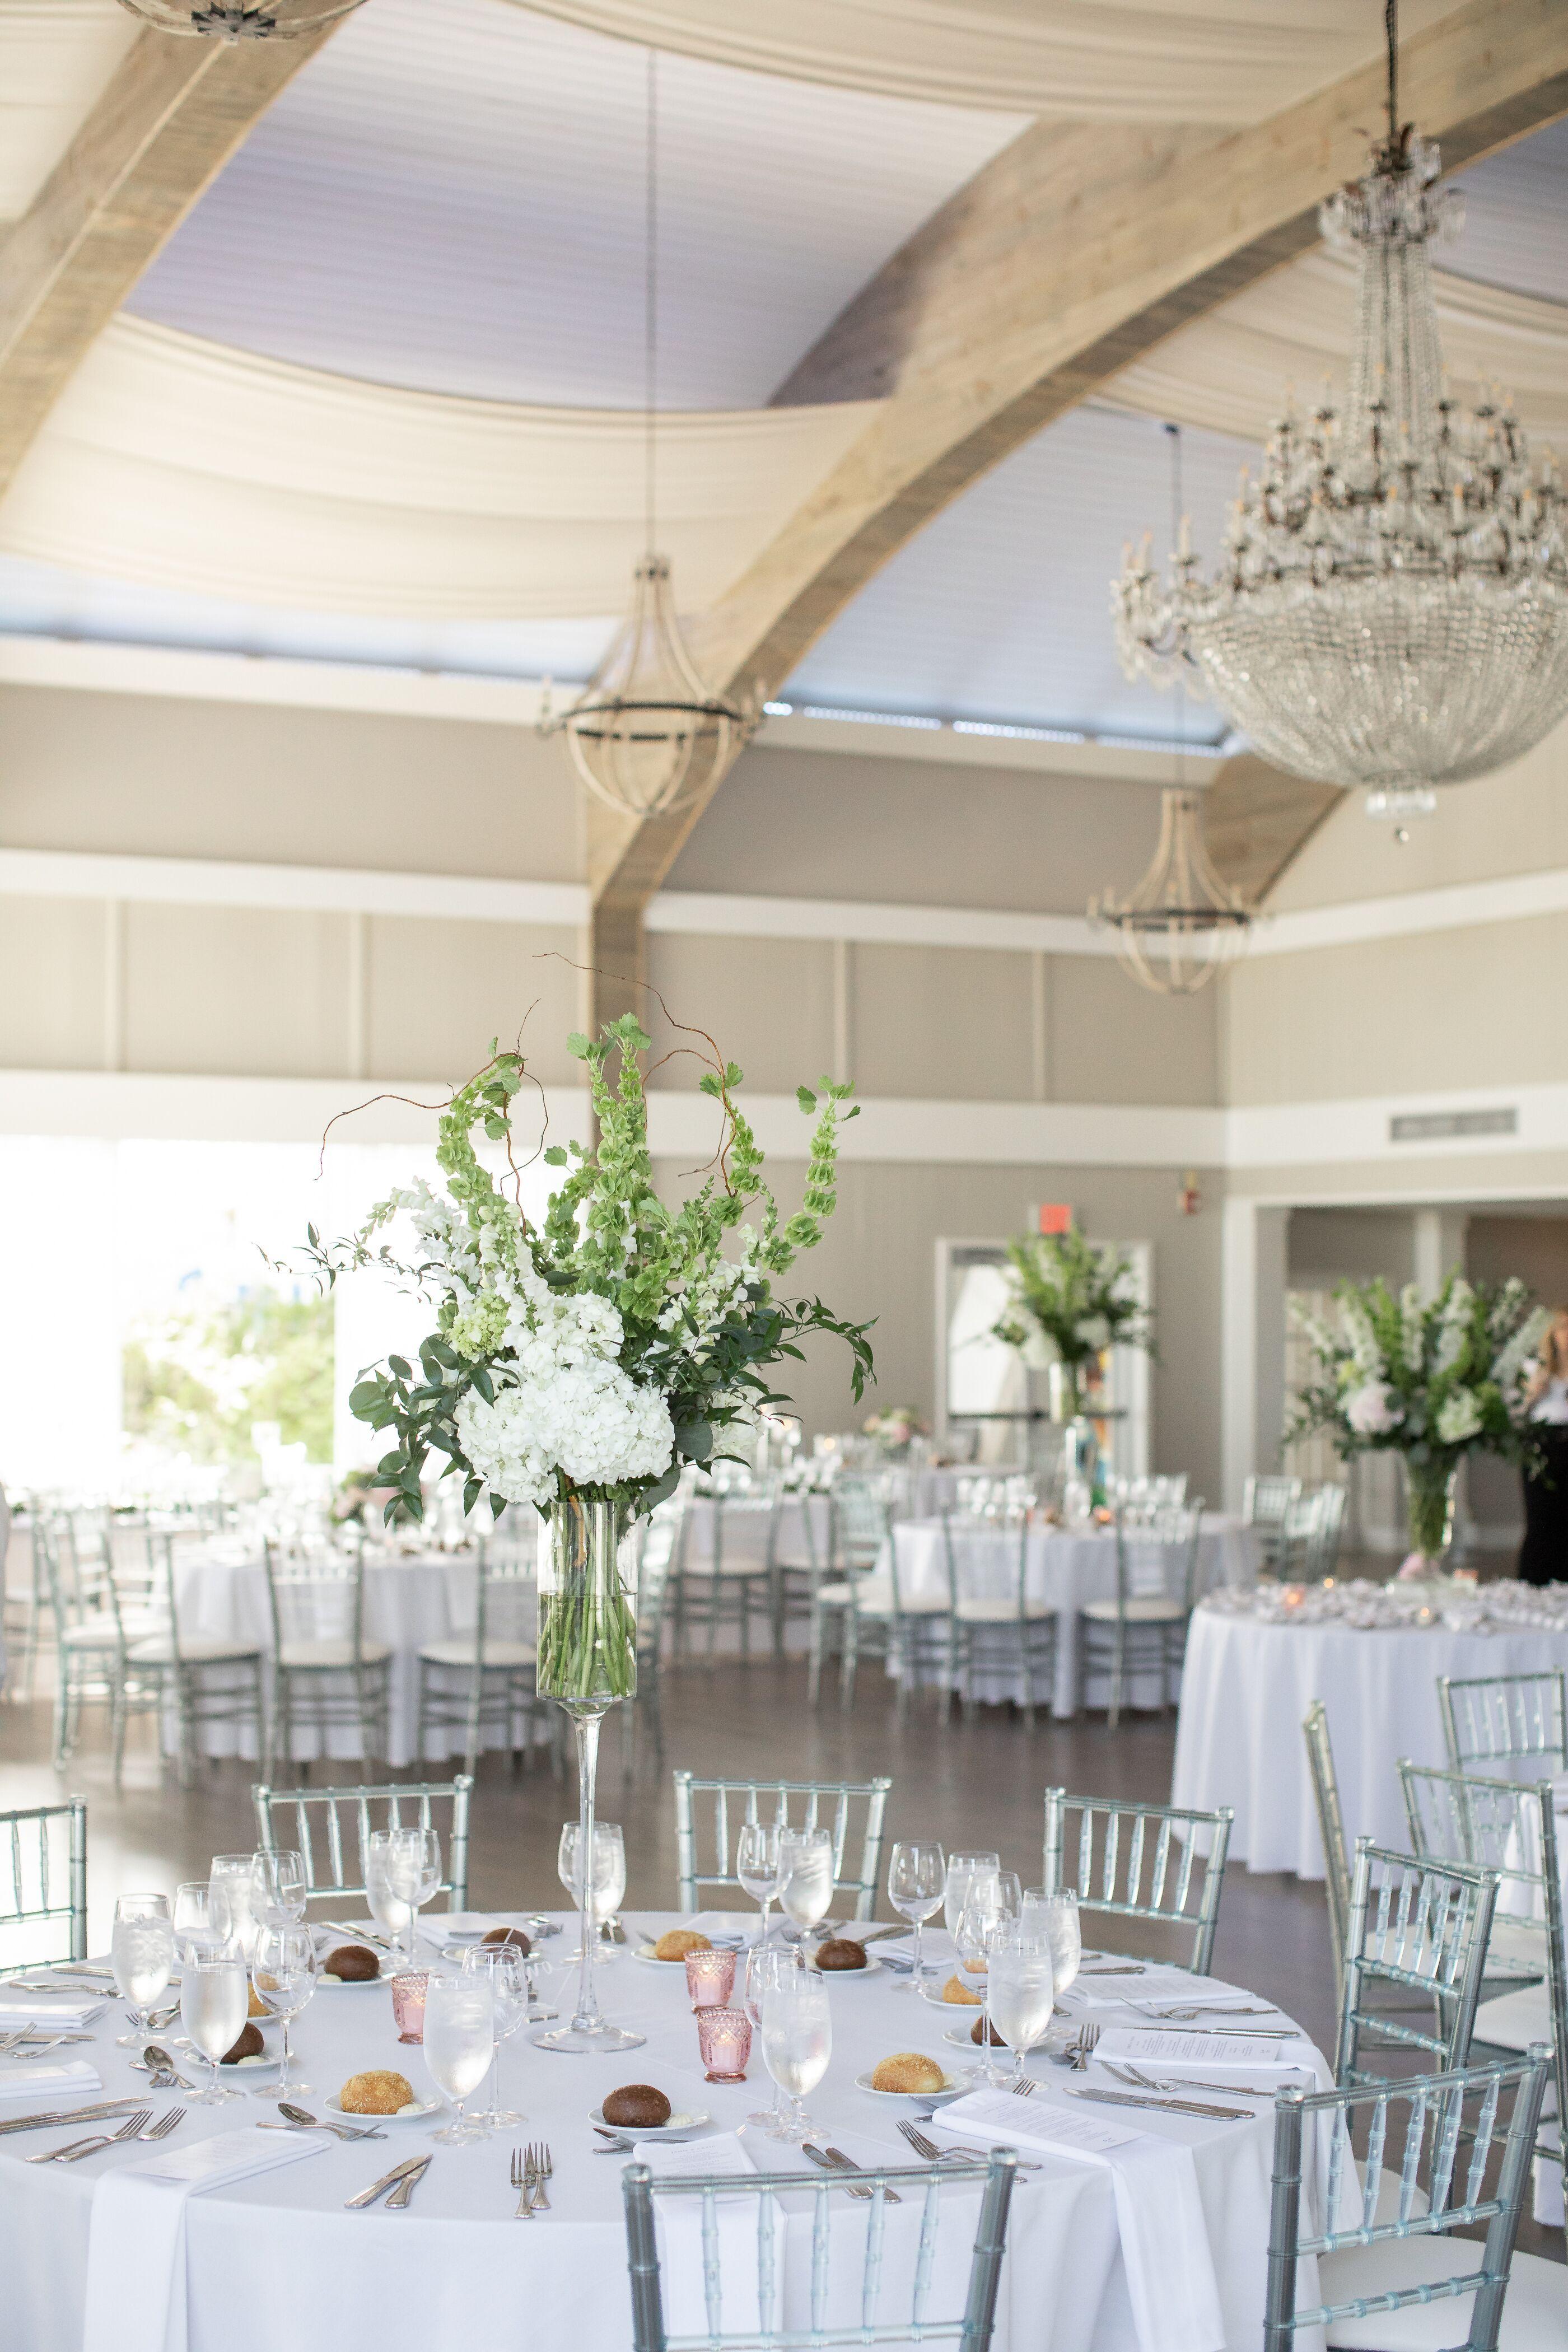 Stunning Indoor Hamptons Wedding At Oceanbleu In Westhampton Beach New York Dream Turned Reality By Hamptons Wedding Wishing Tree Wedding Beachfront Weddings